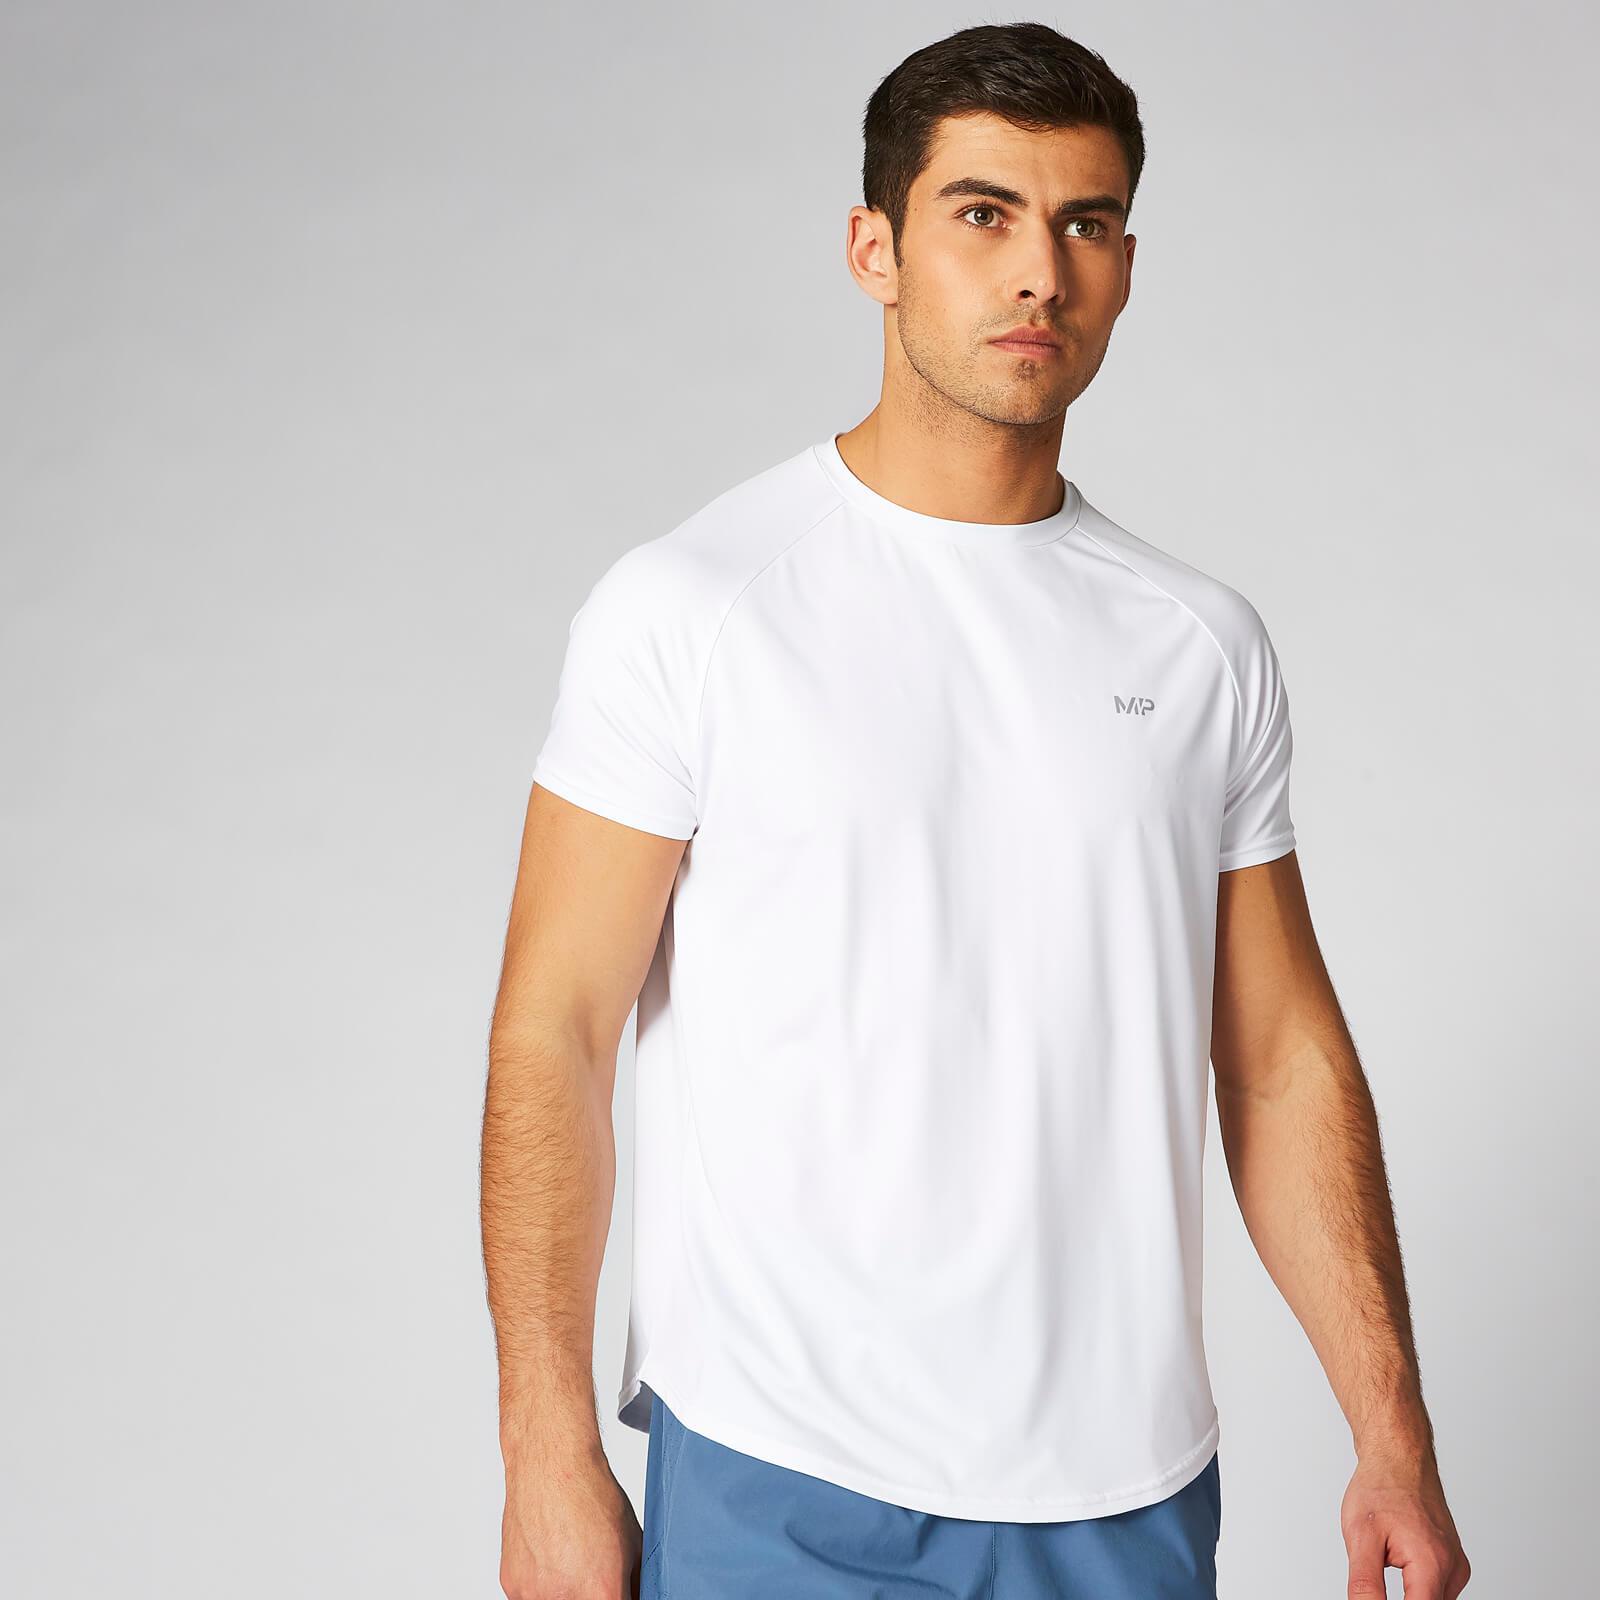 bd2d315fc Dry-Tech Infinity T-Shirt - White